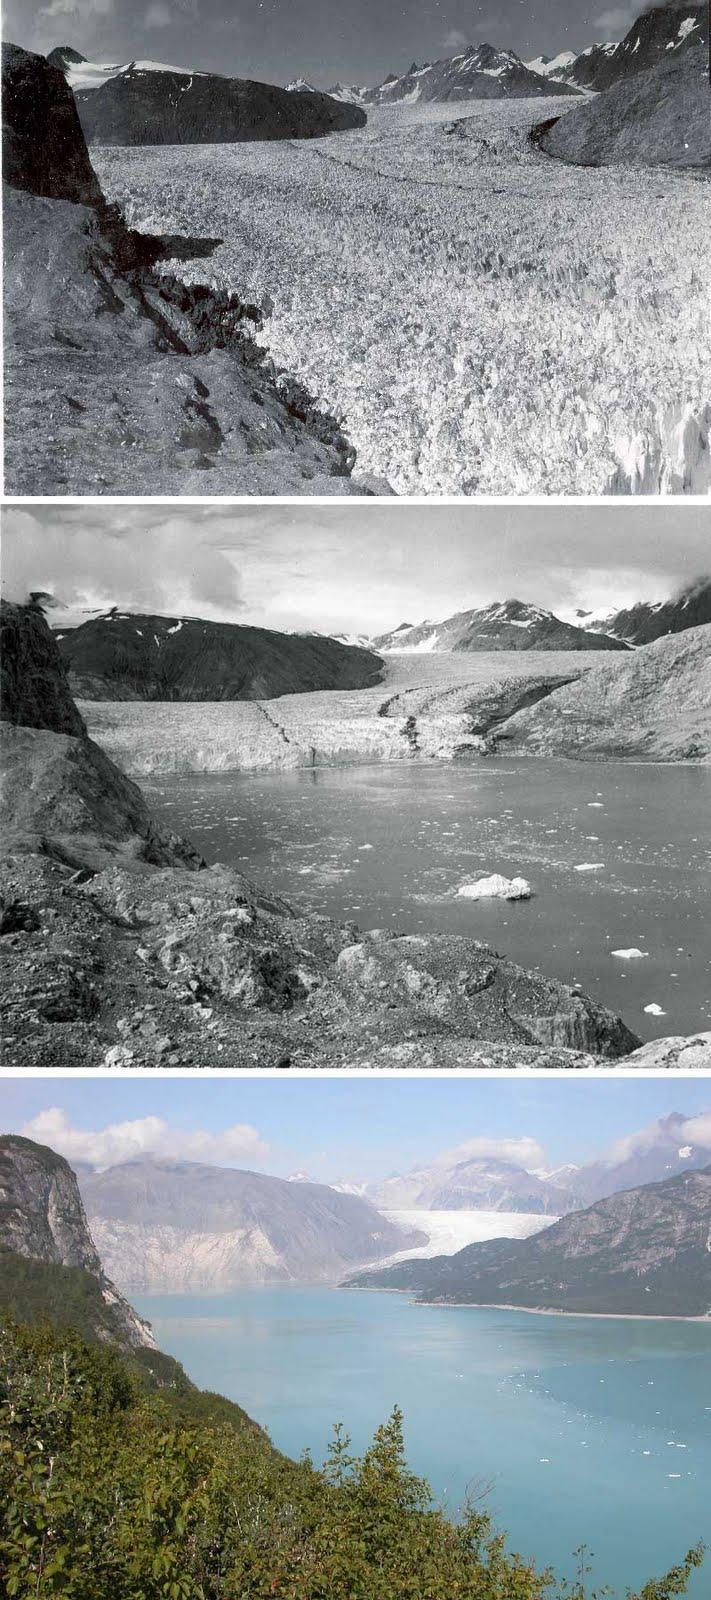 Bill-Alaska Geoscience: Terrestrial Ice: Glaciers